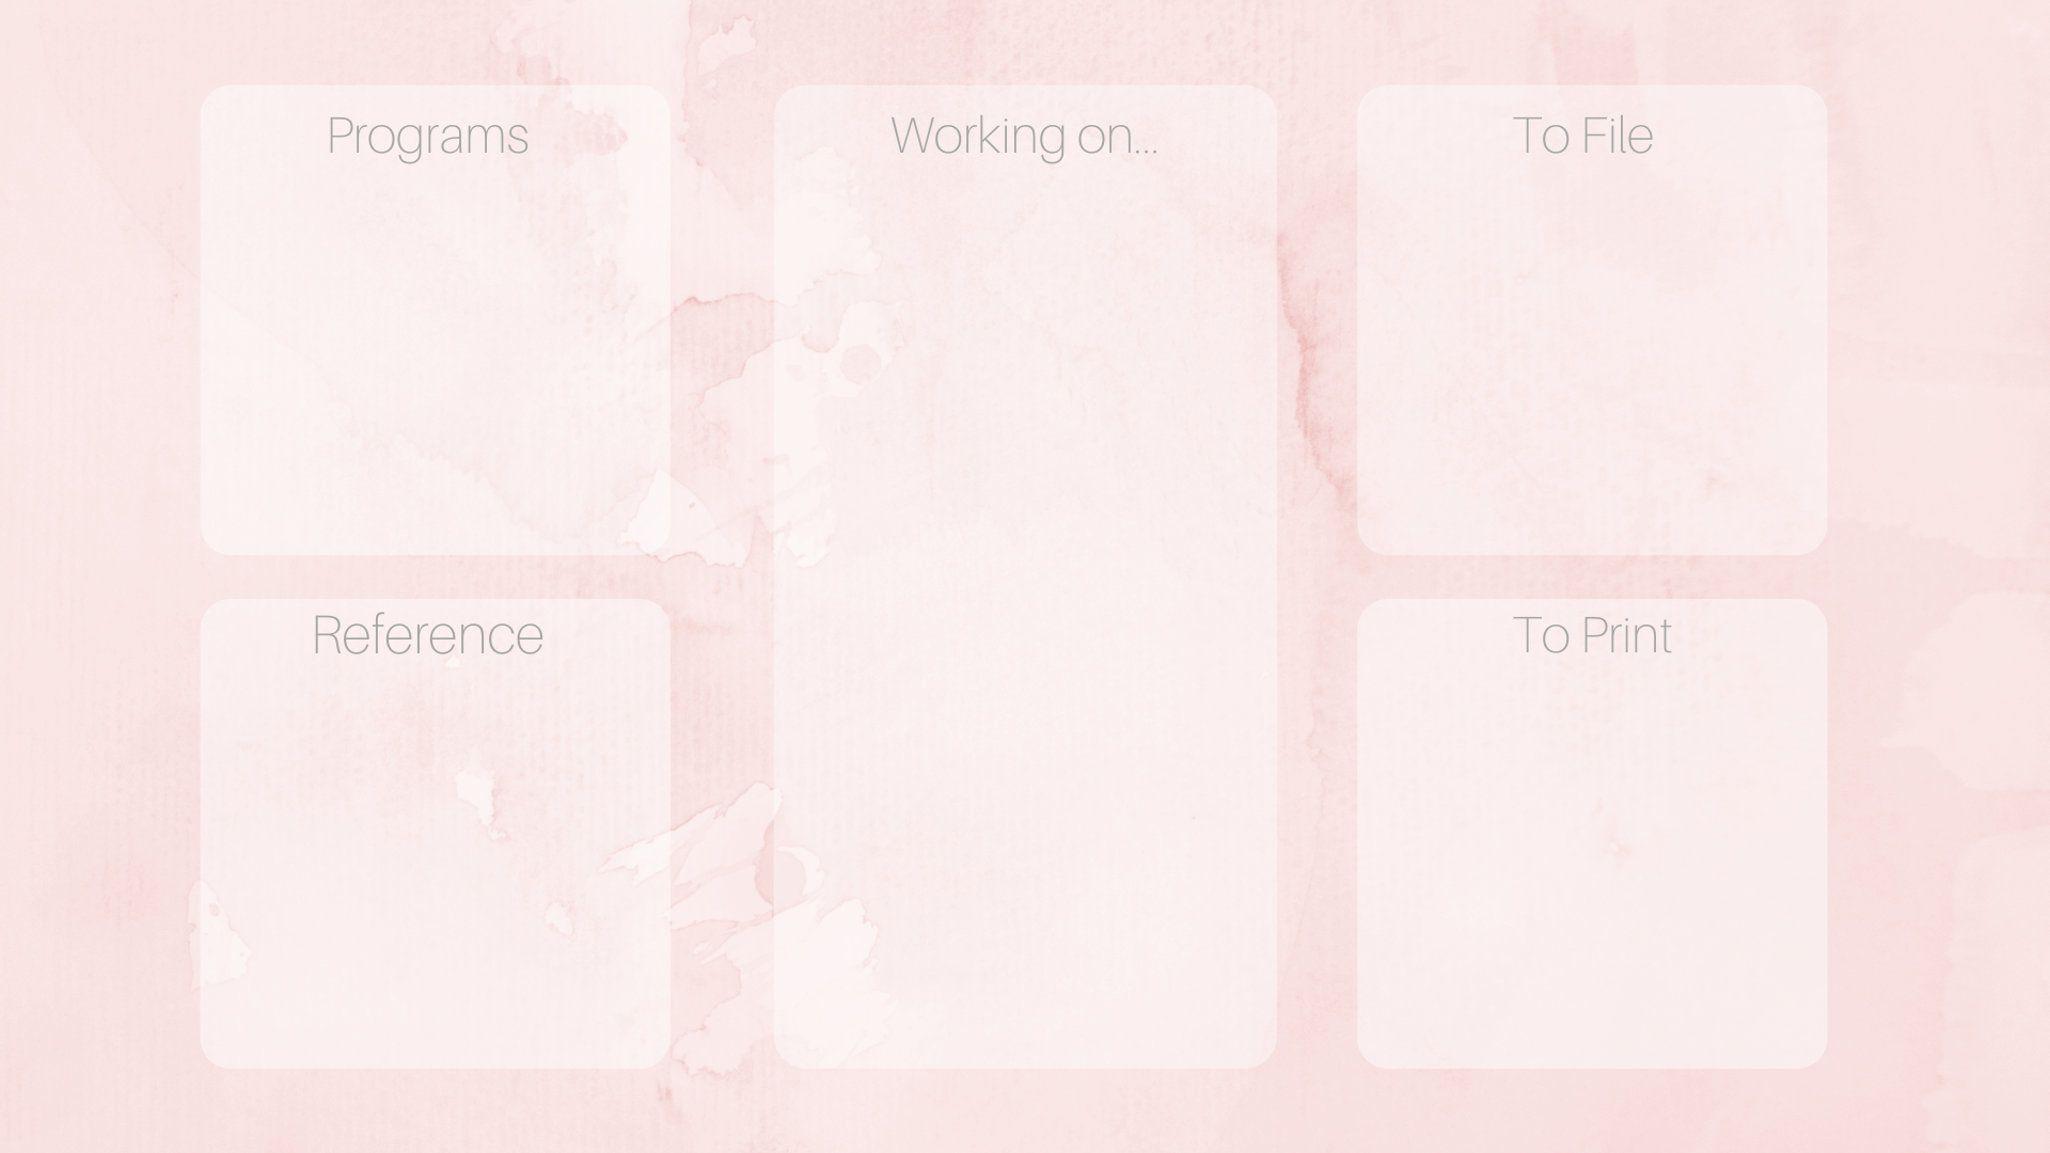 Pink Watercolor Desktop Organizer Wallpaper Organization Organiza Computer Wallpaper Desktop Wallpapers Desktop Wallpaper Organizer Desktop Wallpaper Macbook